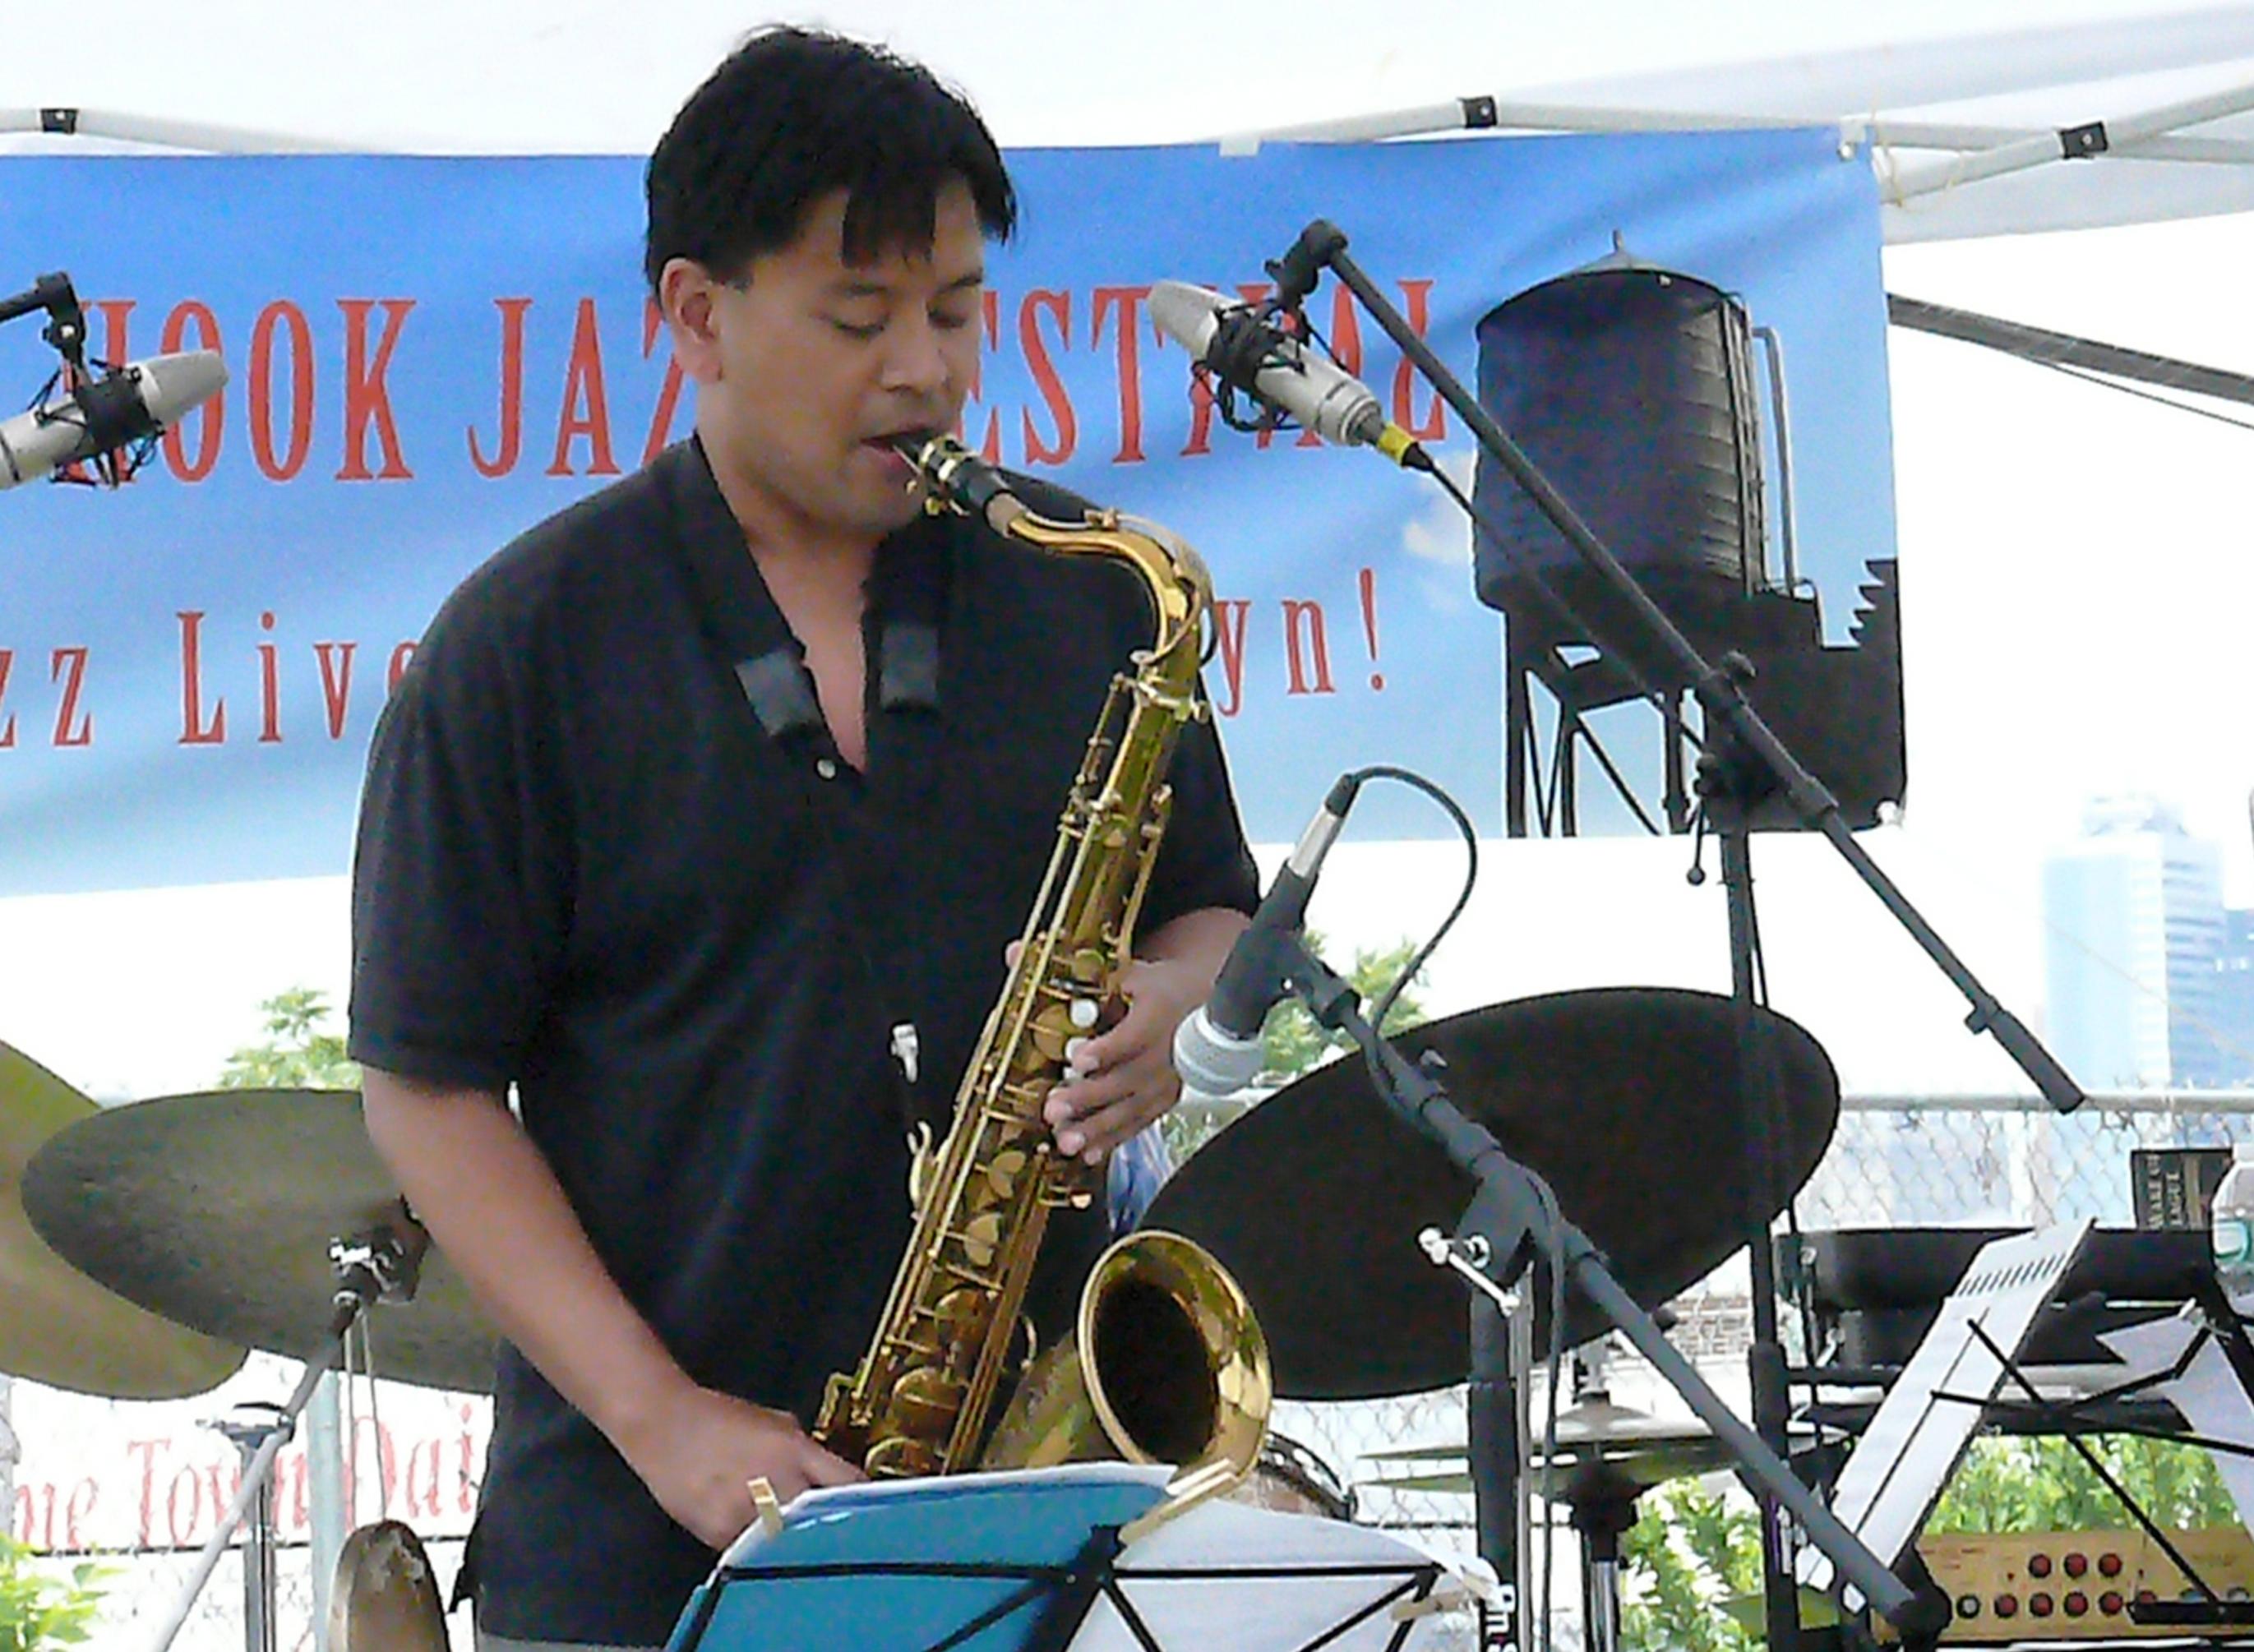 Jon irabagon at red hook jazz festival, new york in june 2013